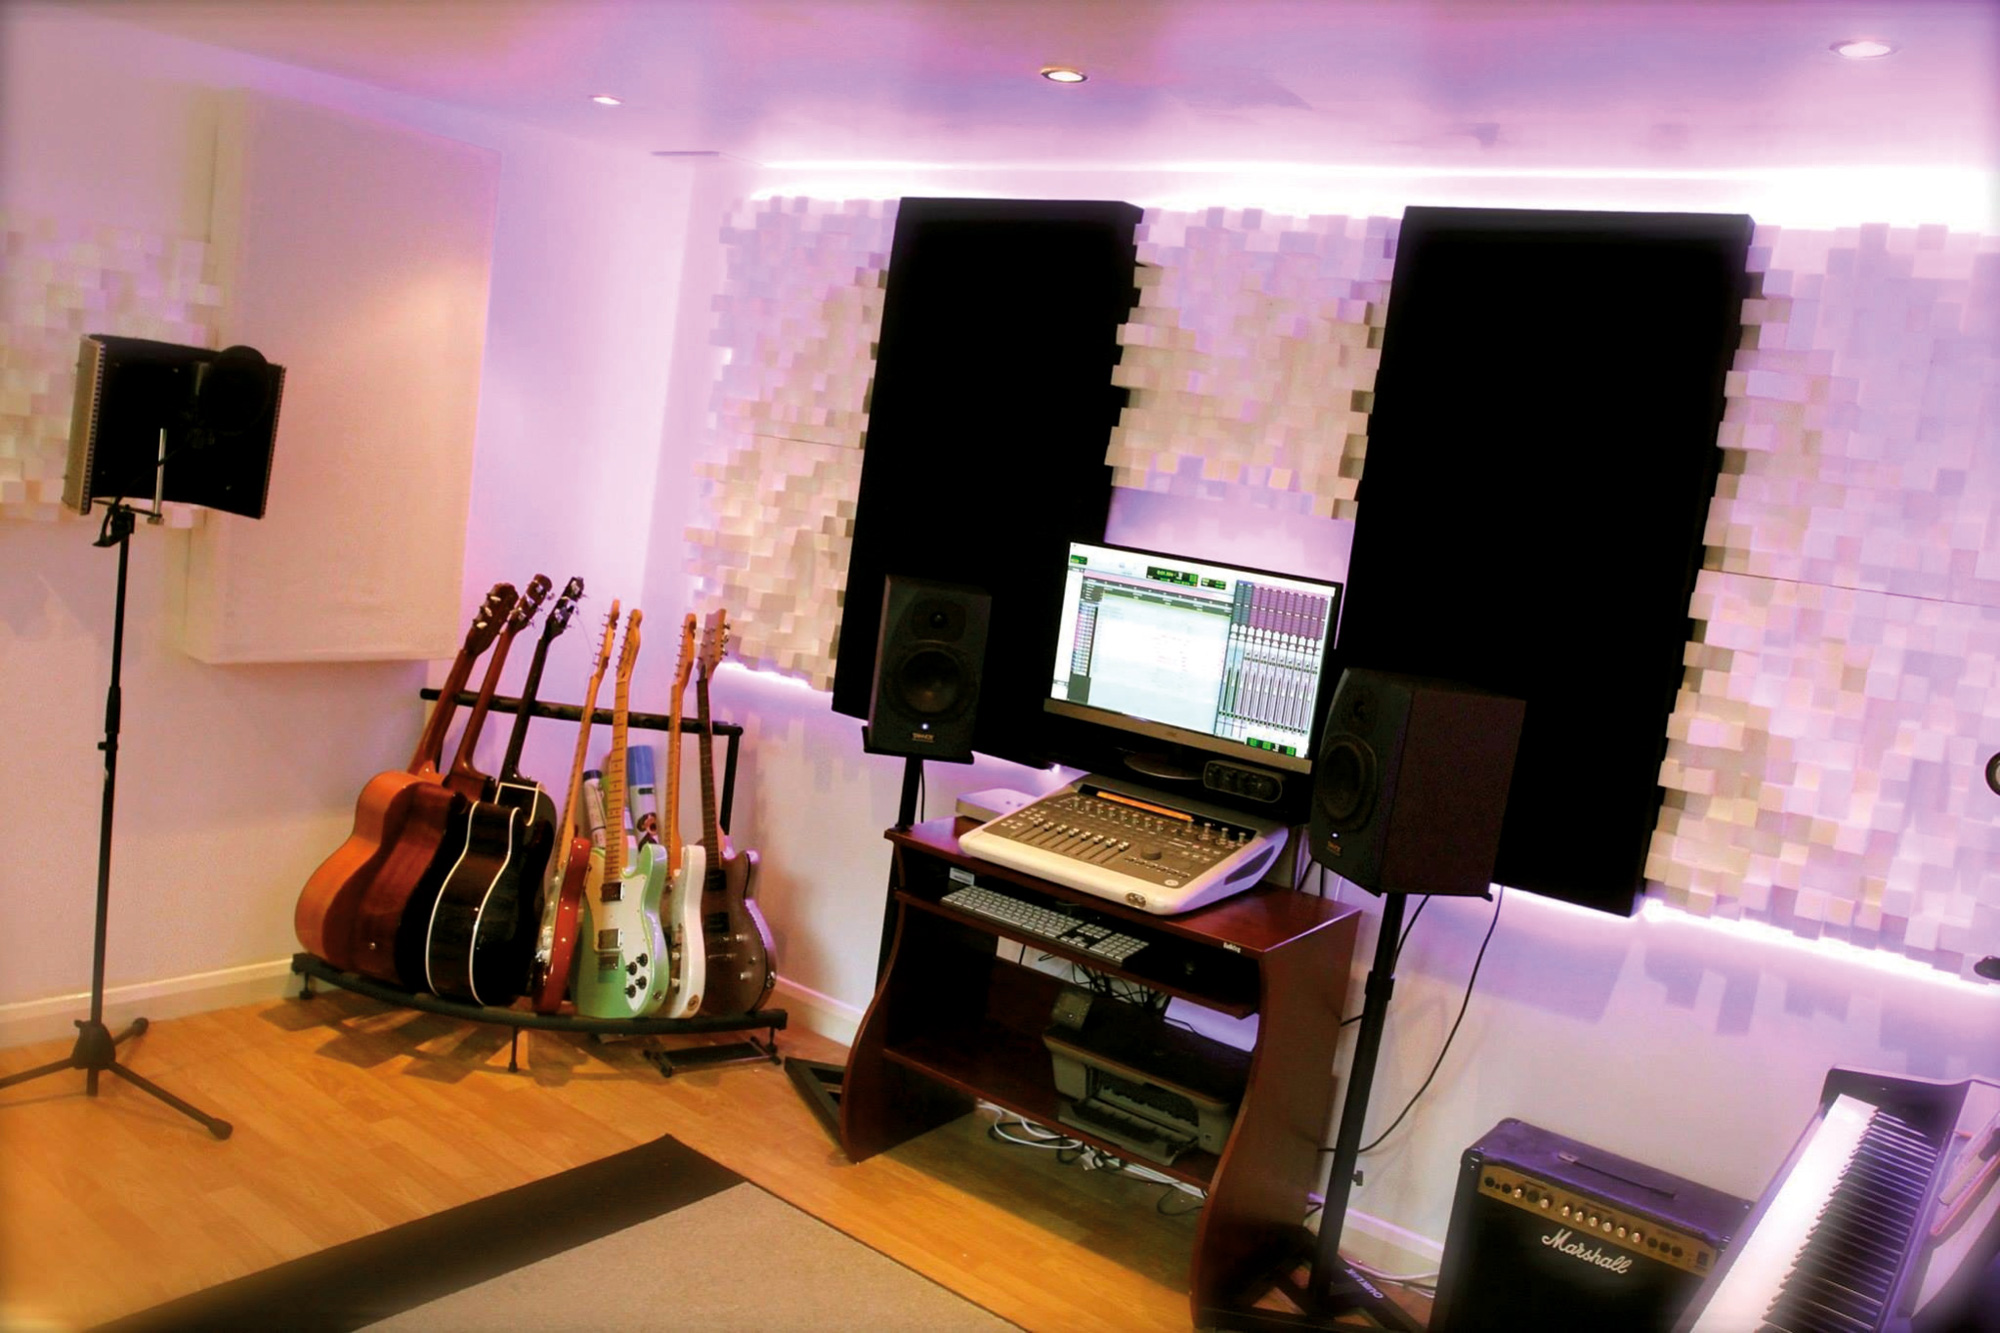 cm acoustics recording studio acoustic treatment panels bass traps absorbers.jpg